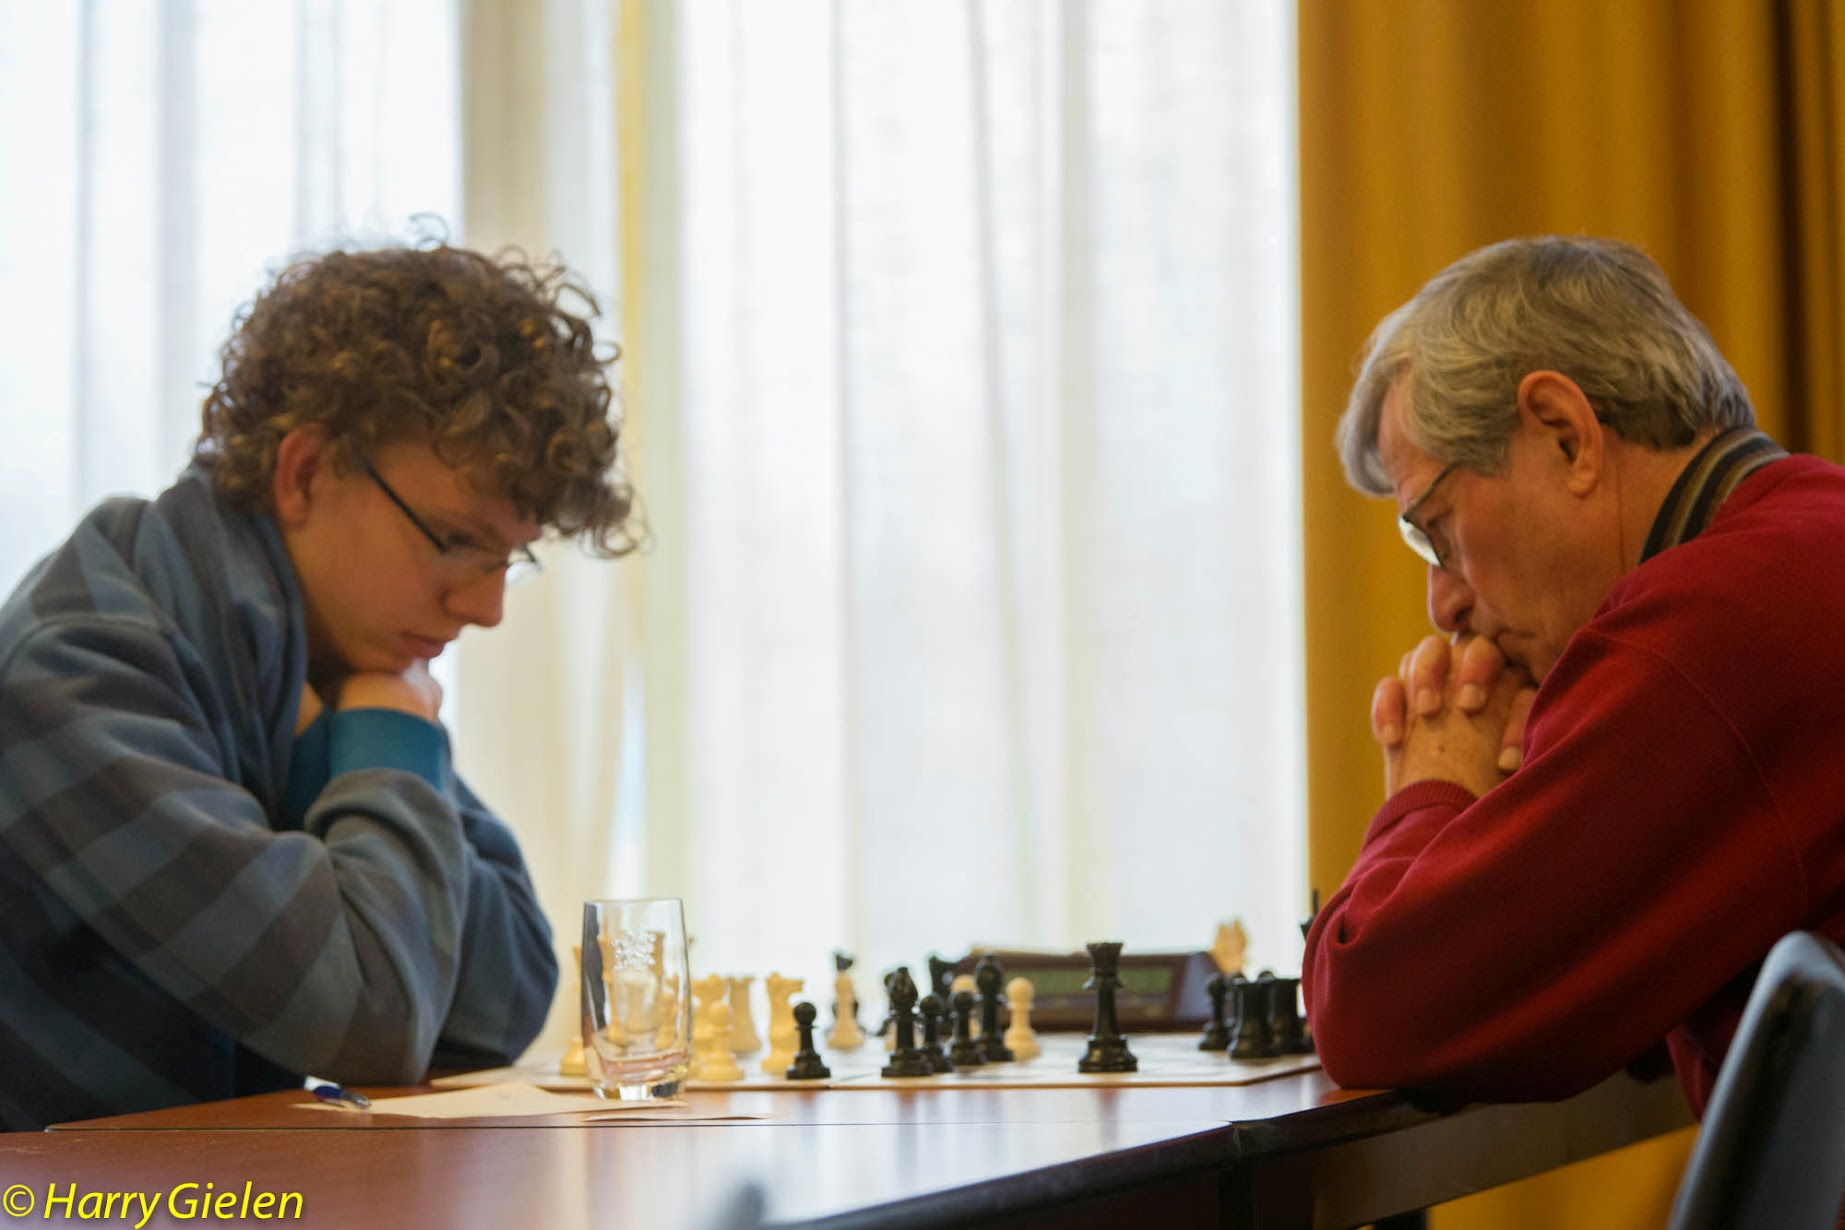 George Scharke tegen Jeljer Dijkstra